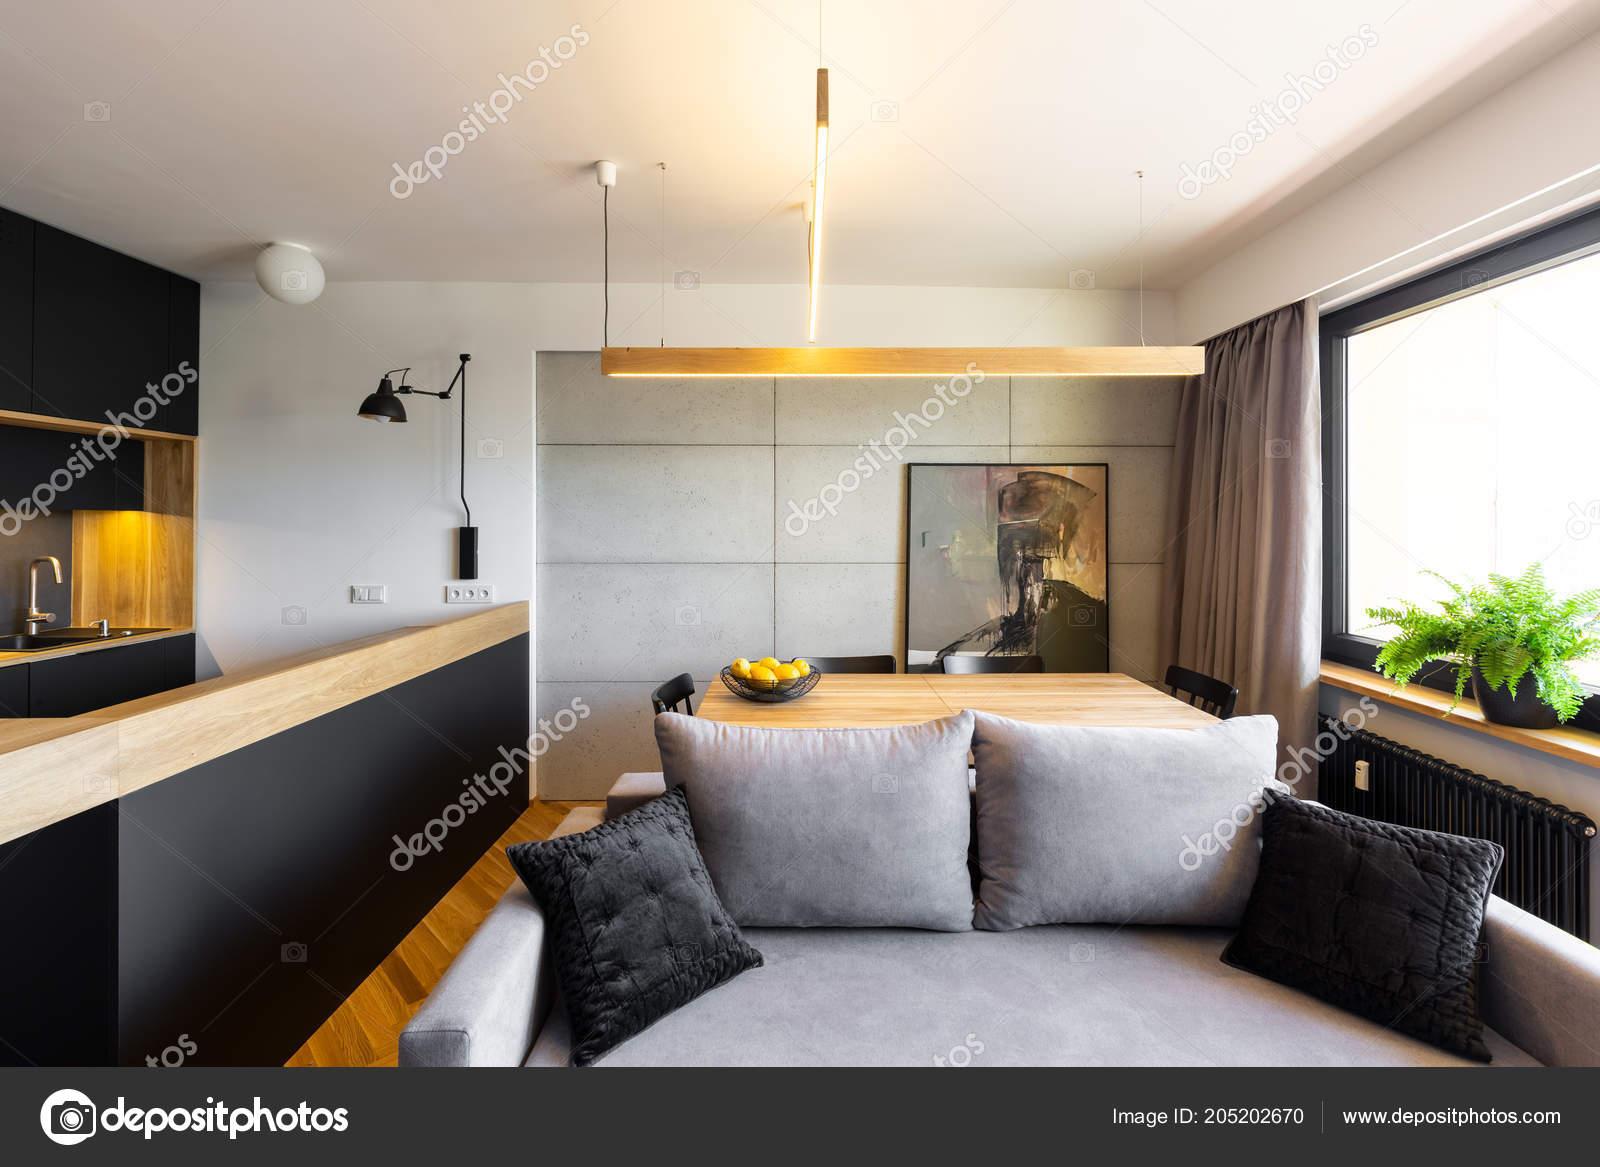 Pleasant Pillows Grey Sofa Modern Apartment Interior Black Kitchen Beatyapartments Chair Design Images Beatyapartmentscom